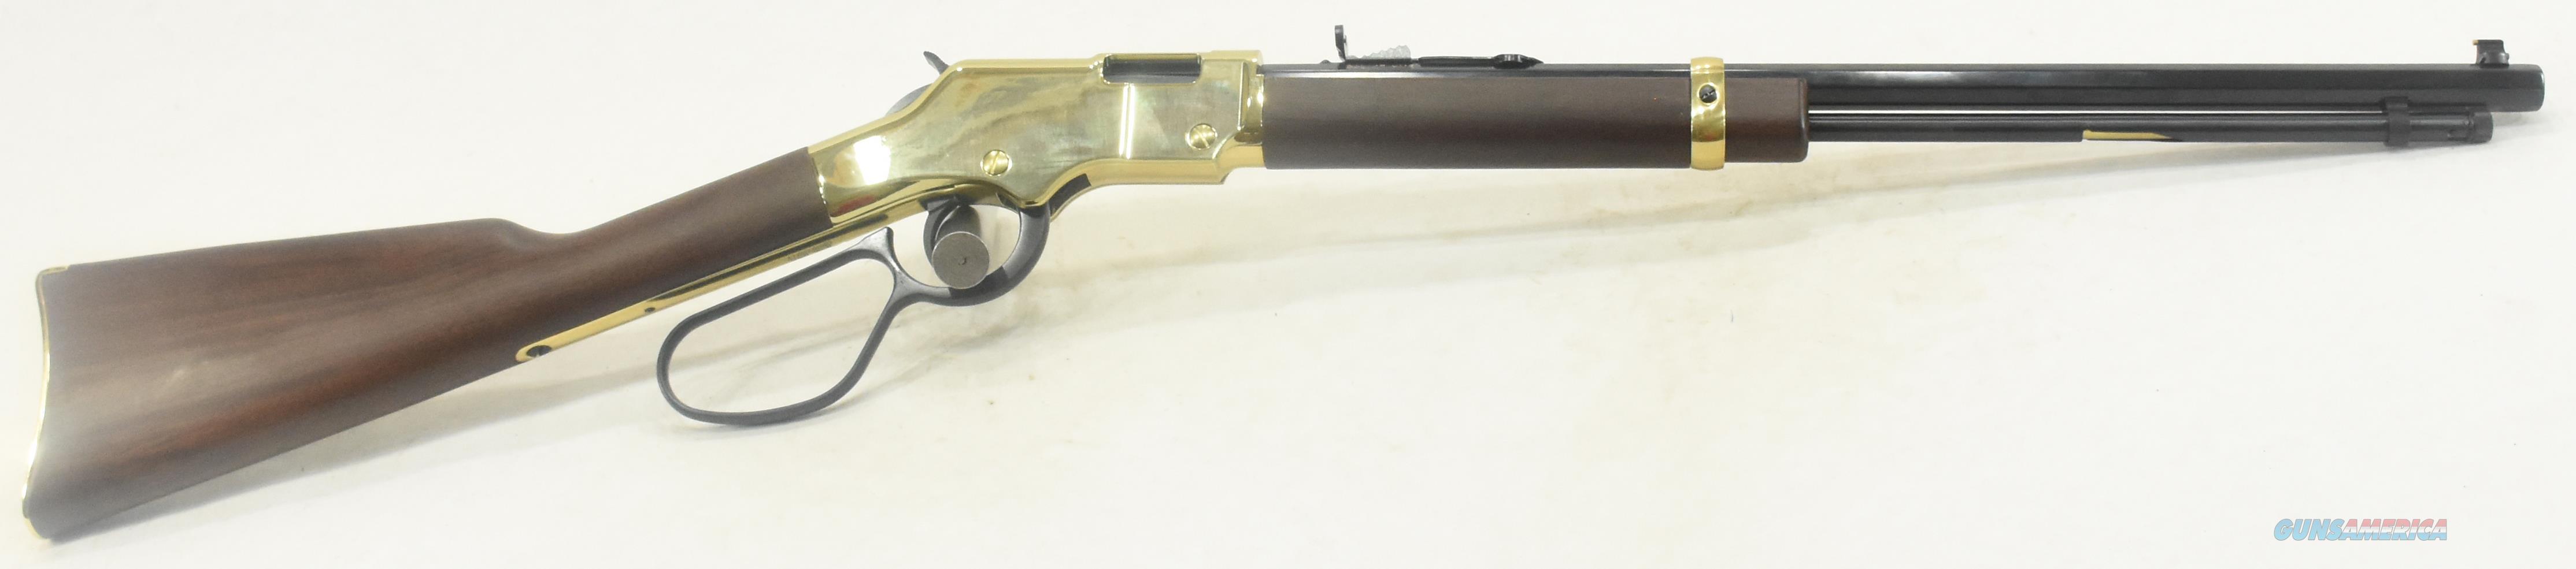 Golden Boy Lever Lrg Loop 17HMR 20In   H004VL  Guns > Rifles > Henry Rifles - Replica